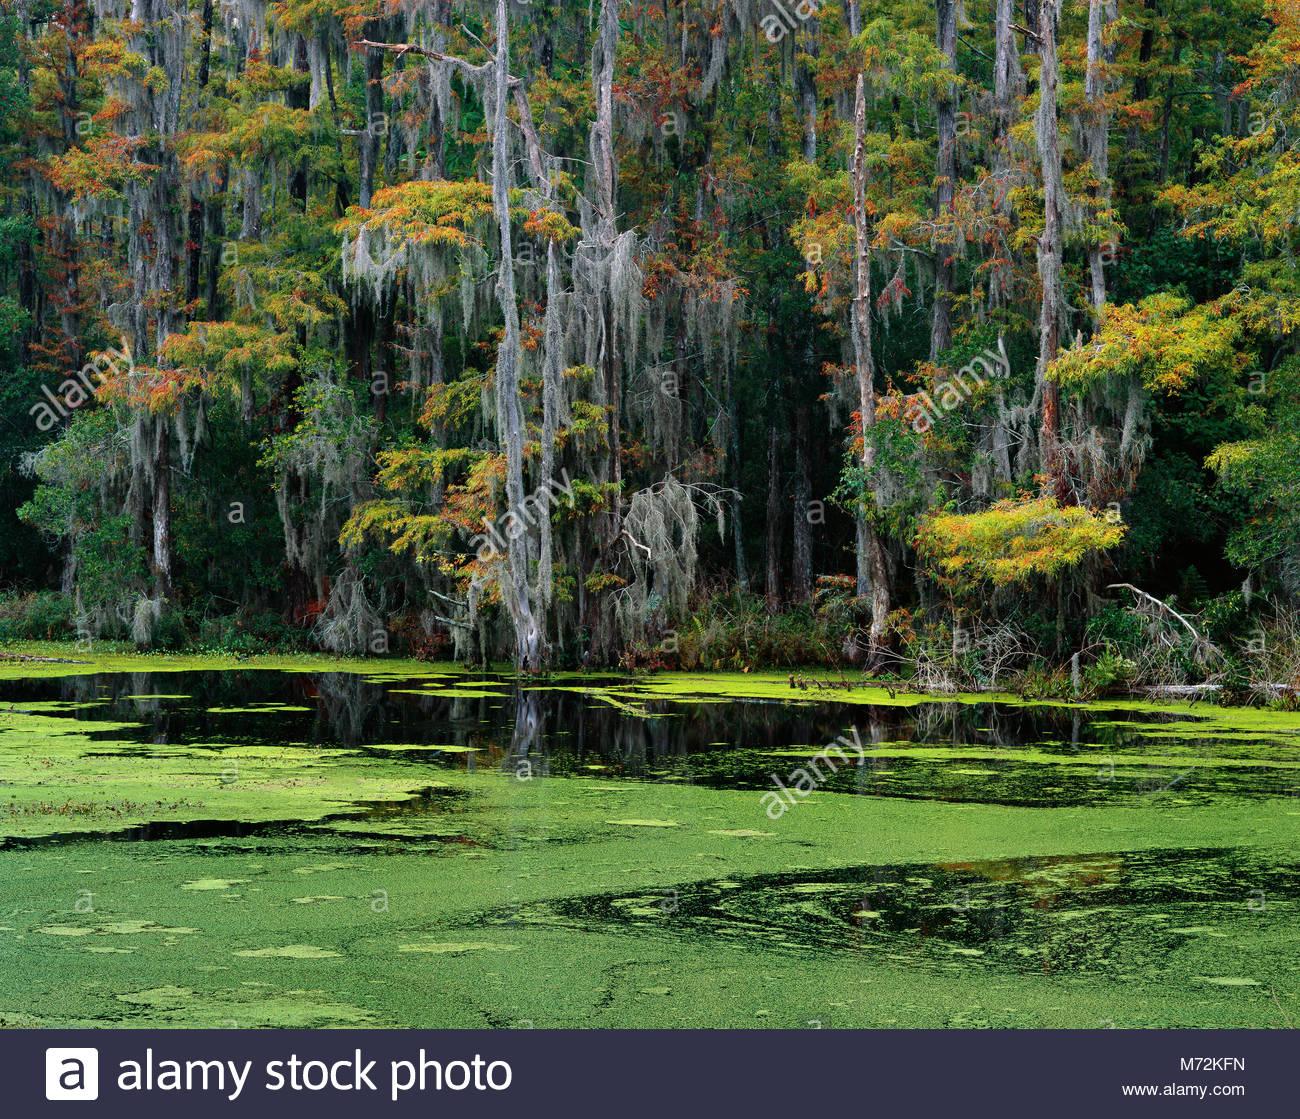 Washoe River, Nature Conservancy Santee Coastal Reserve, McLellanville, South Carolina - Stock Image